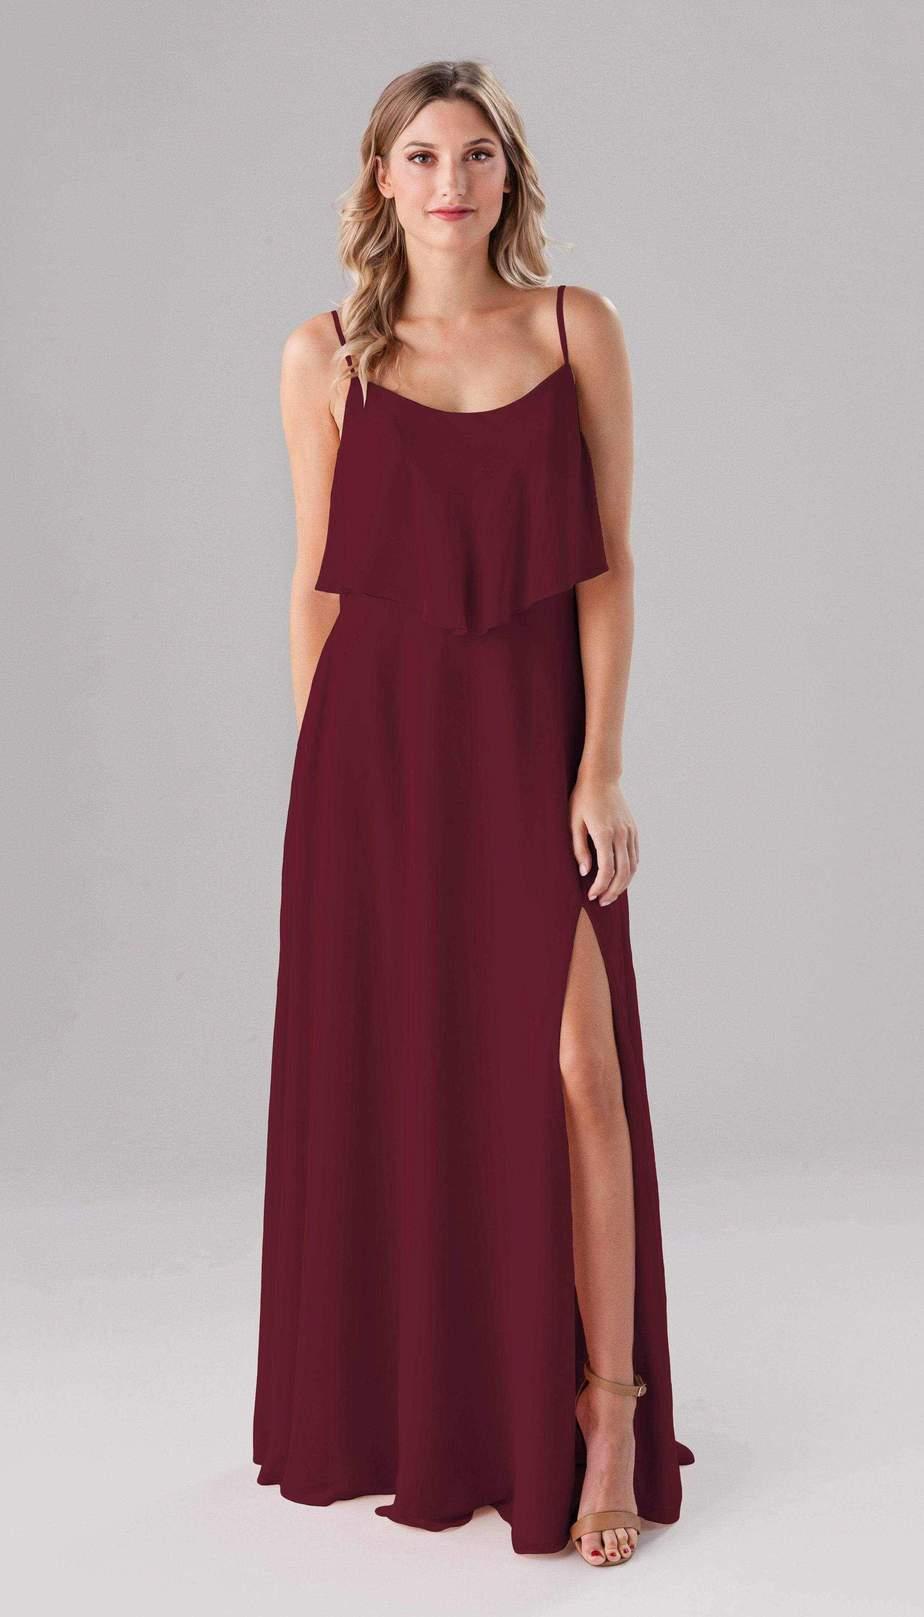 long merlot color bridesmaid dress